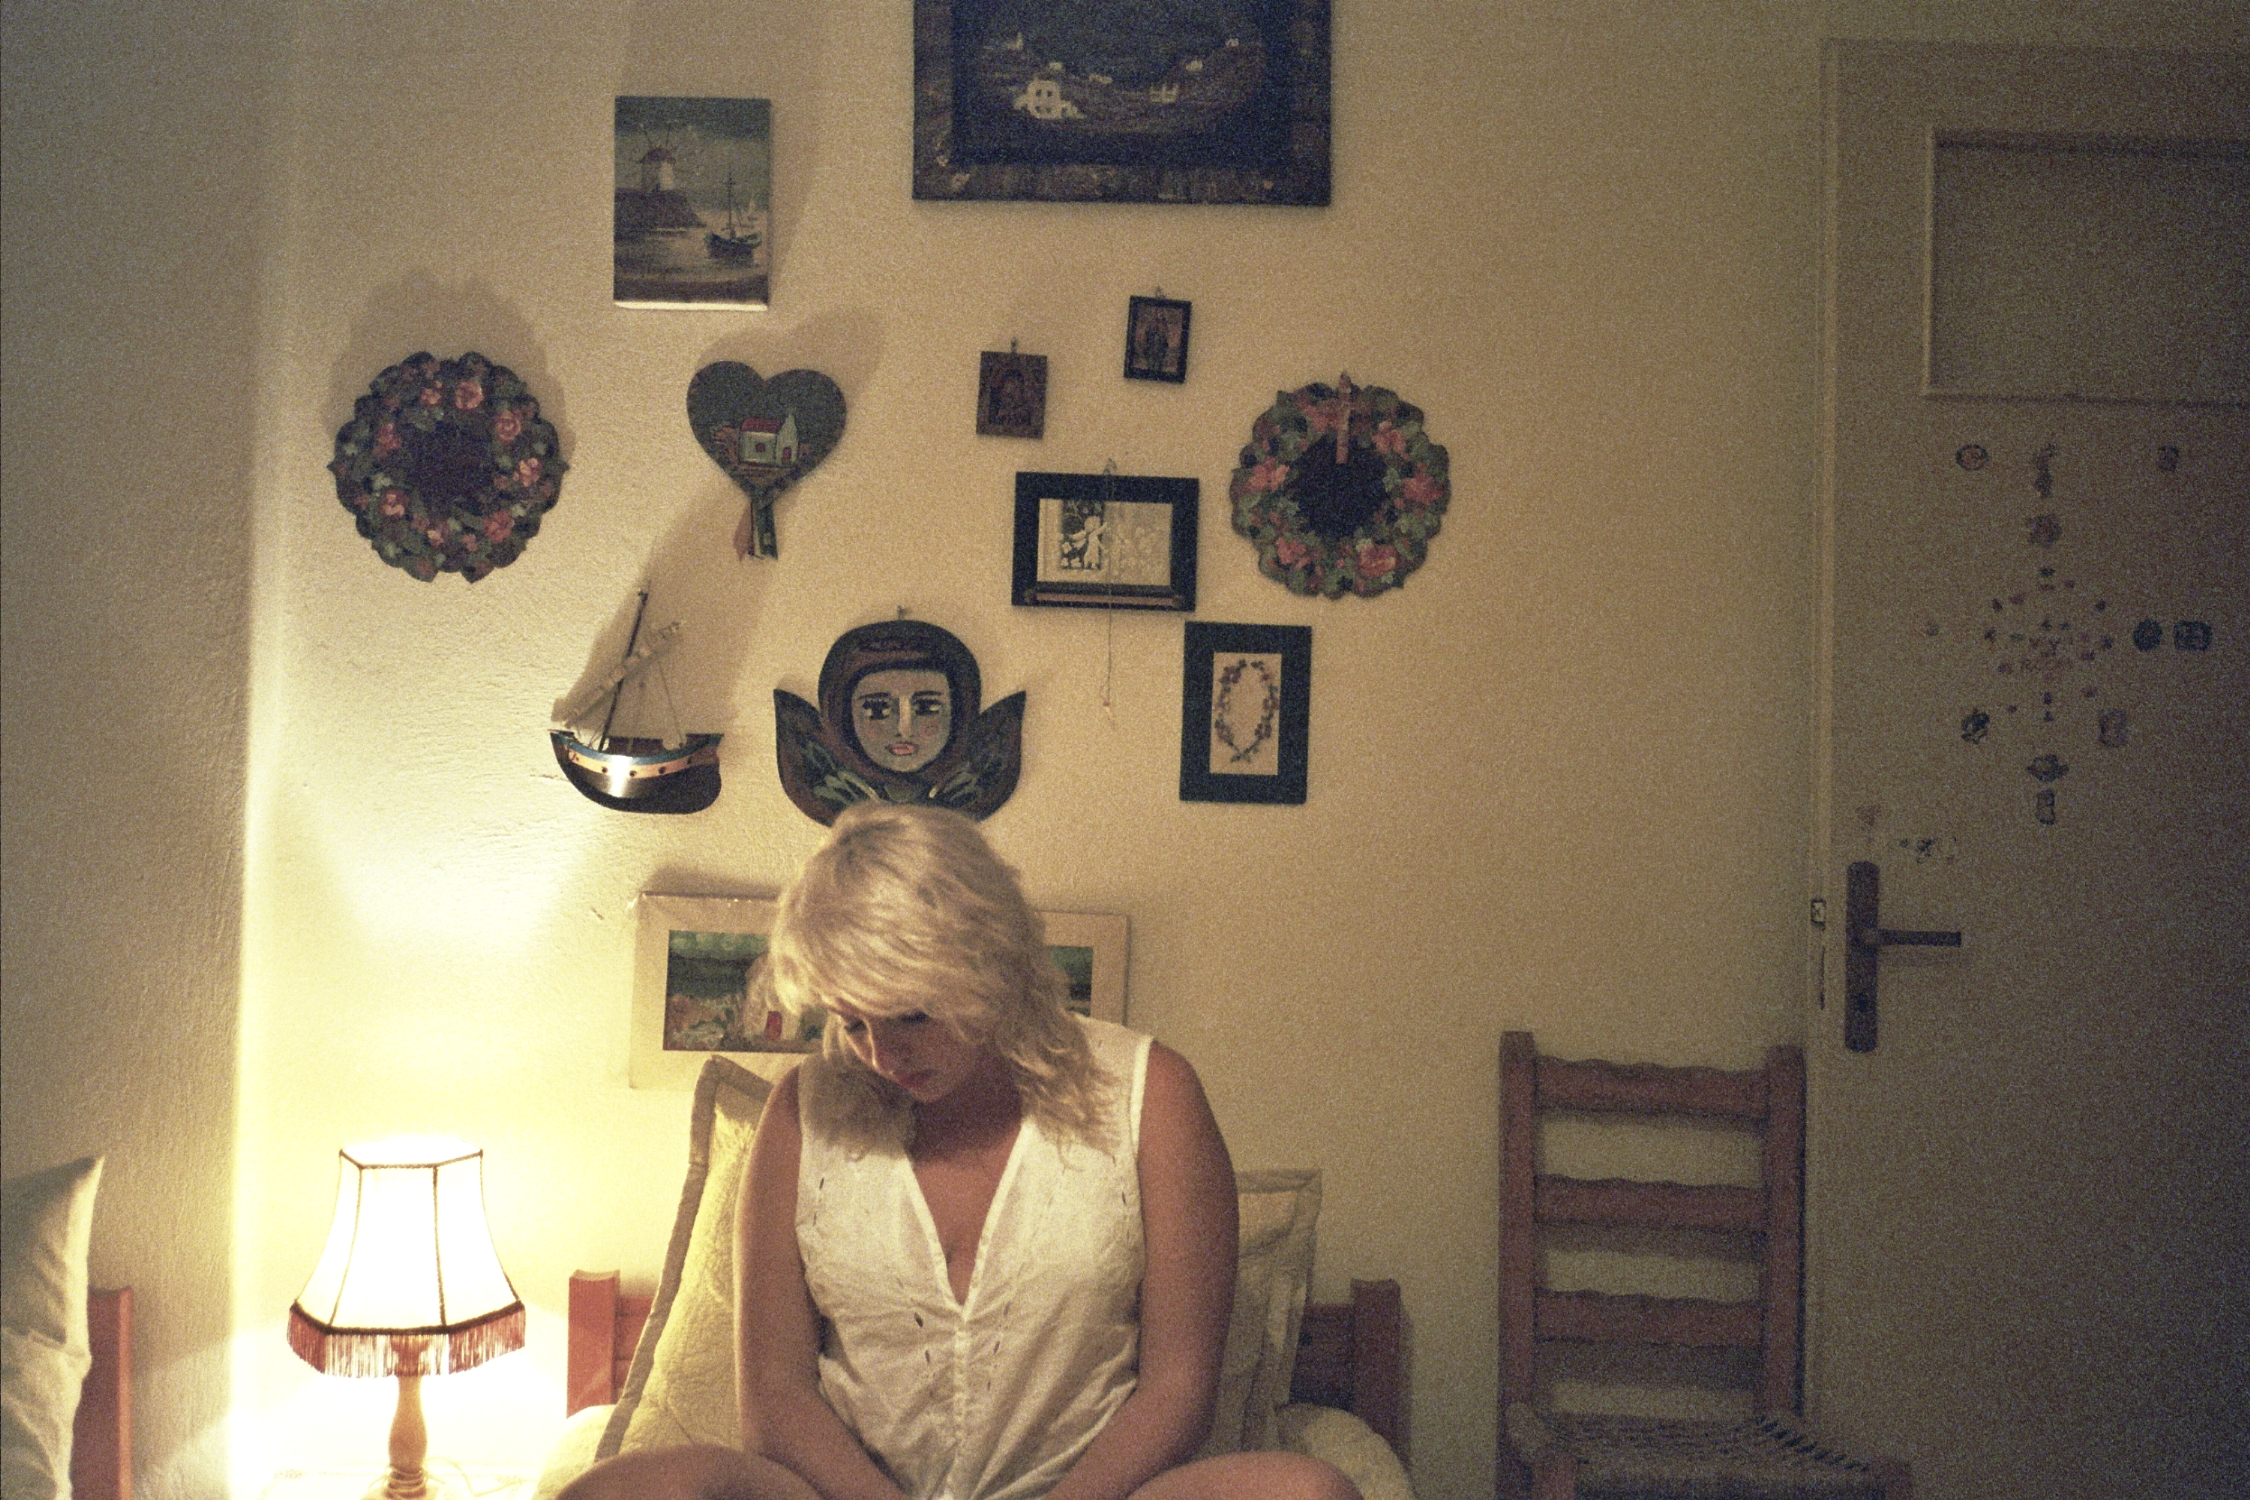 self-portrait in childhood bedroom, mykonos greece, september 2013